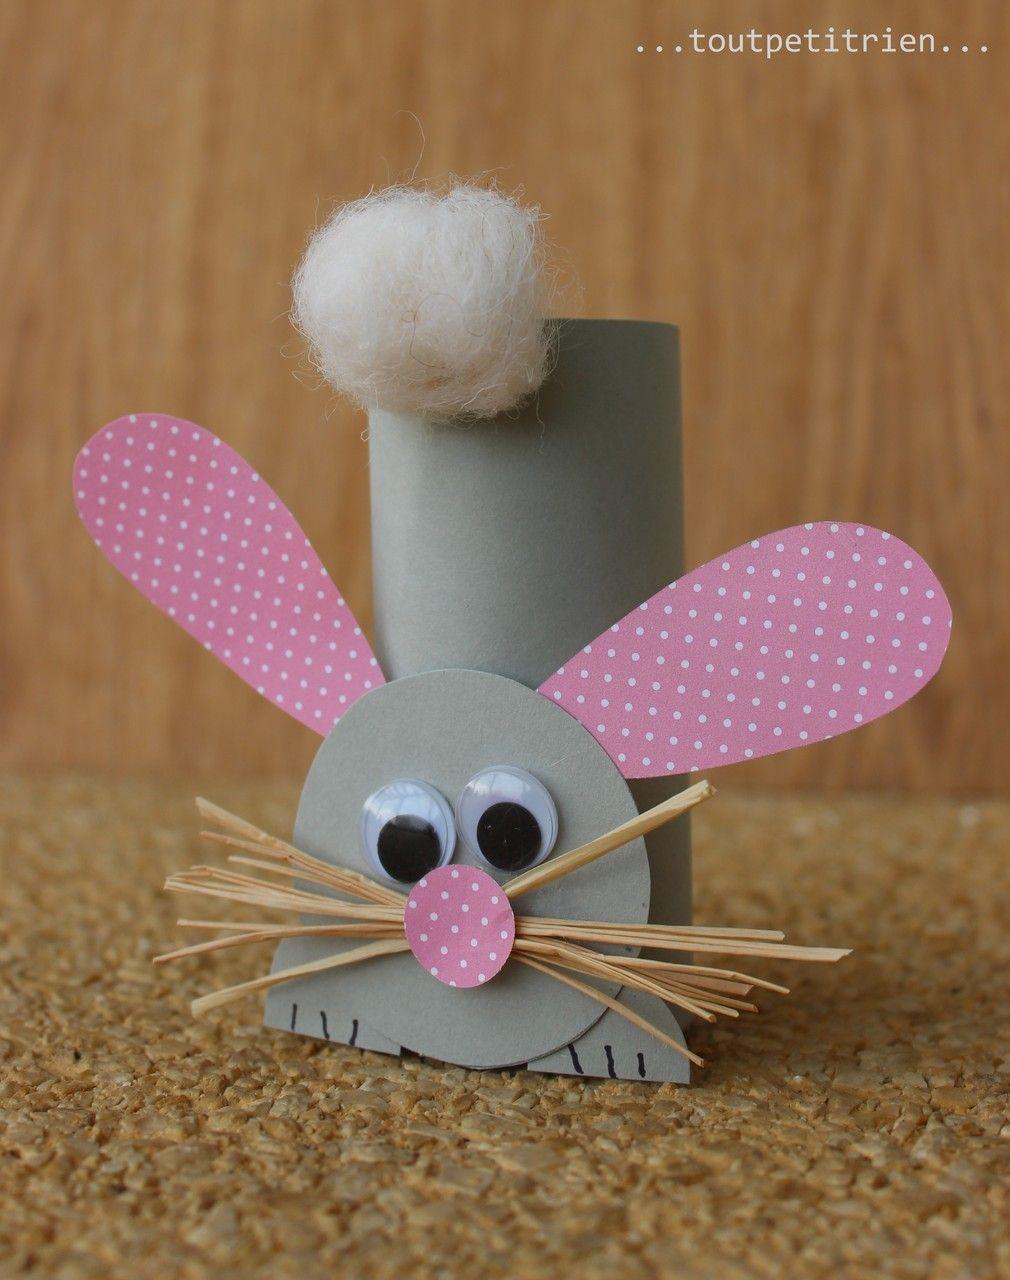 Pin By Antonios Koskinos On Toilet Paper Rolls Pinterest Easter